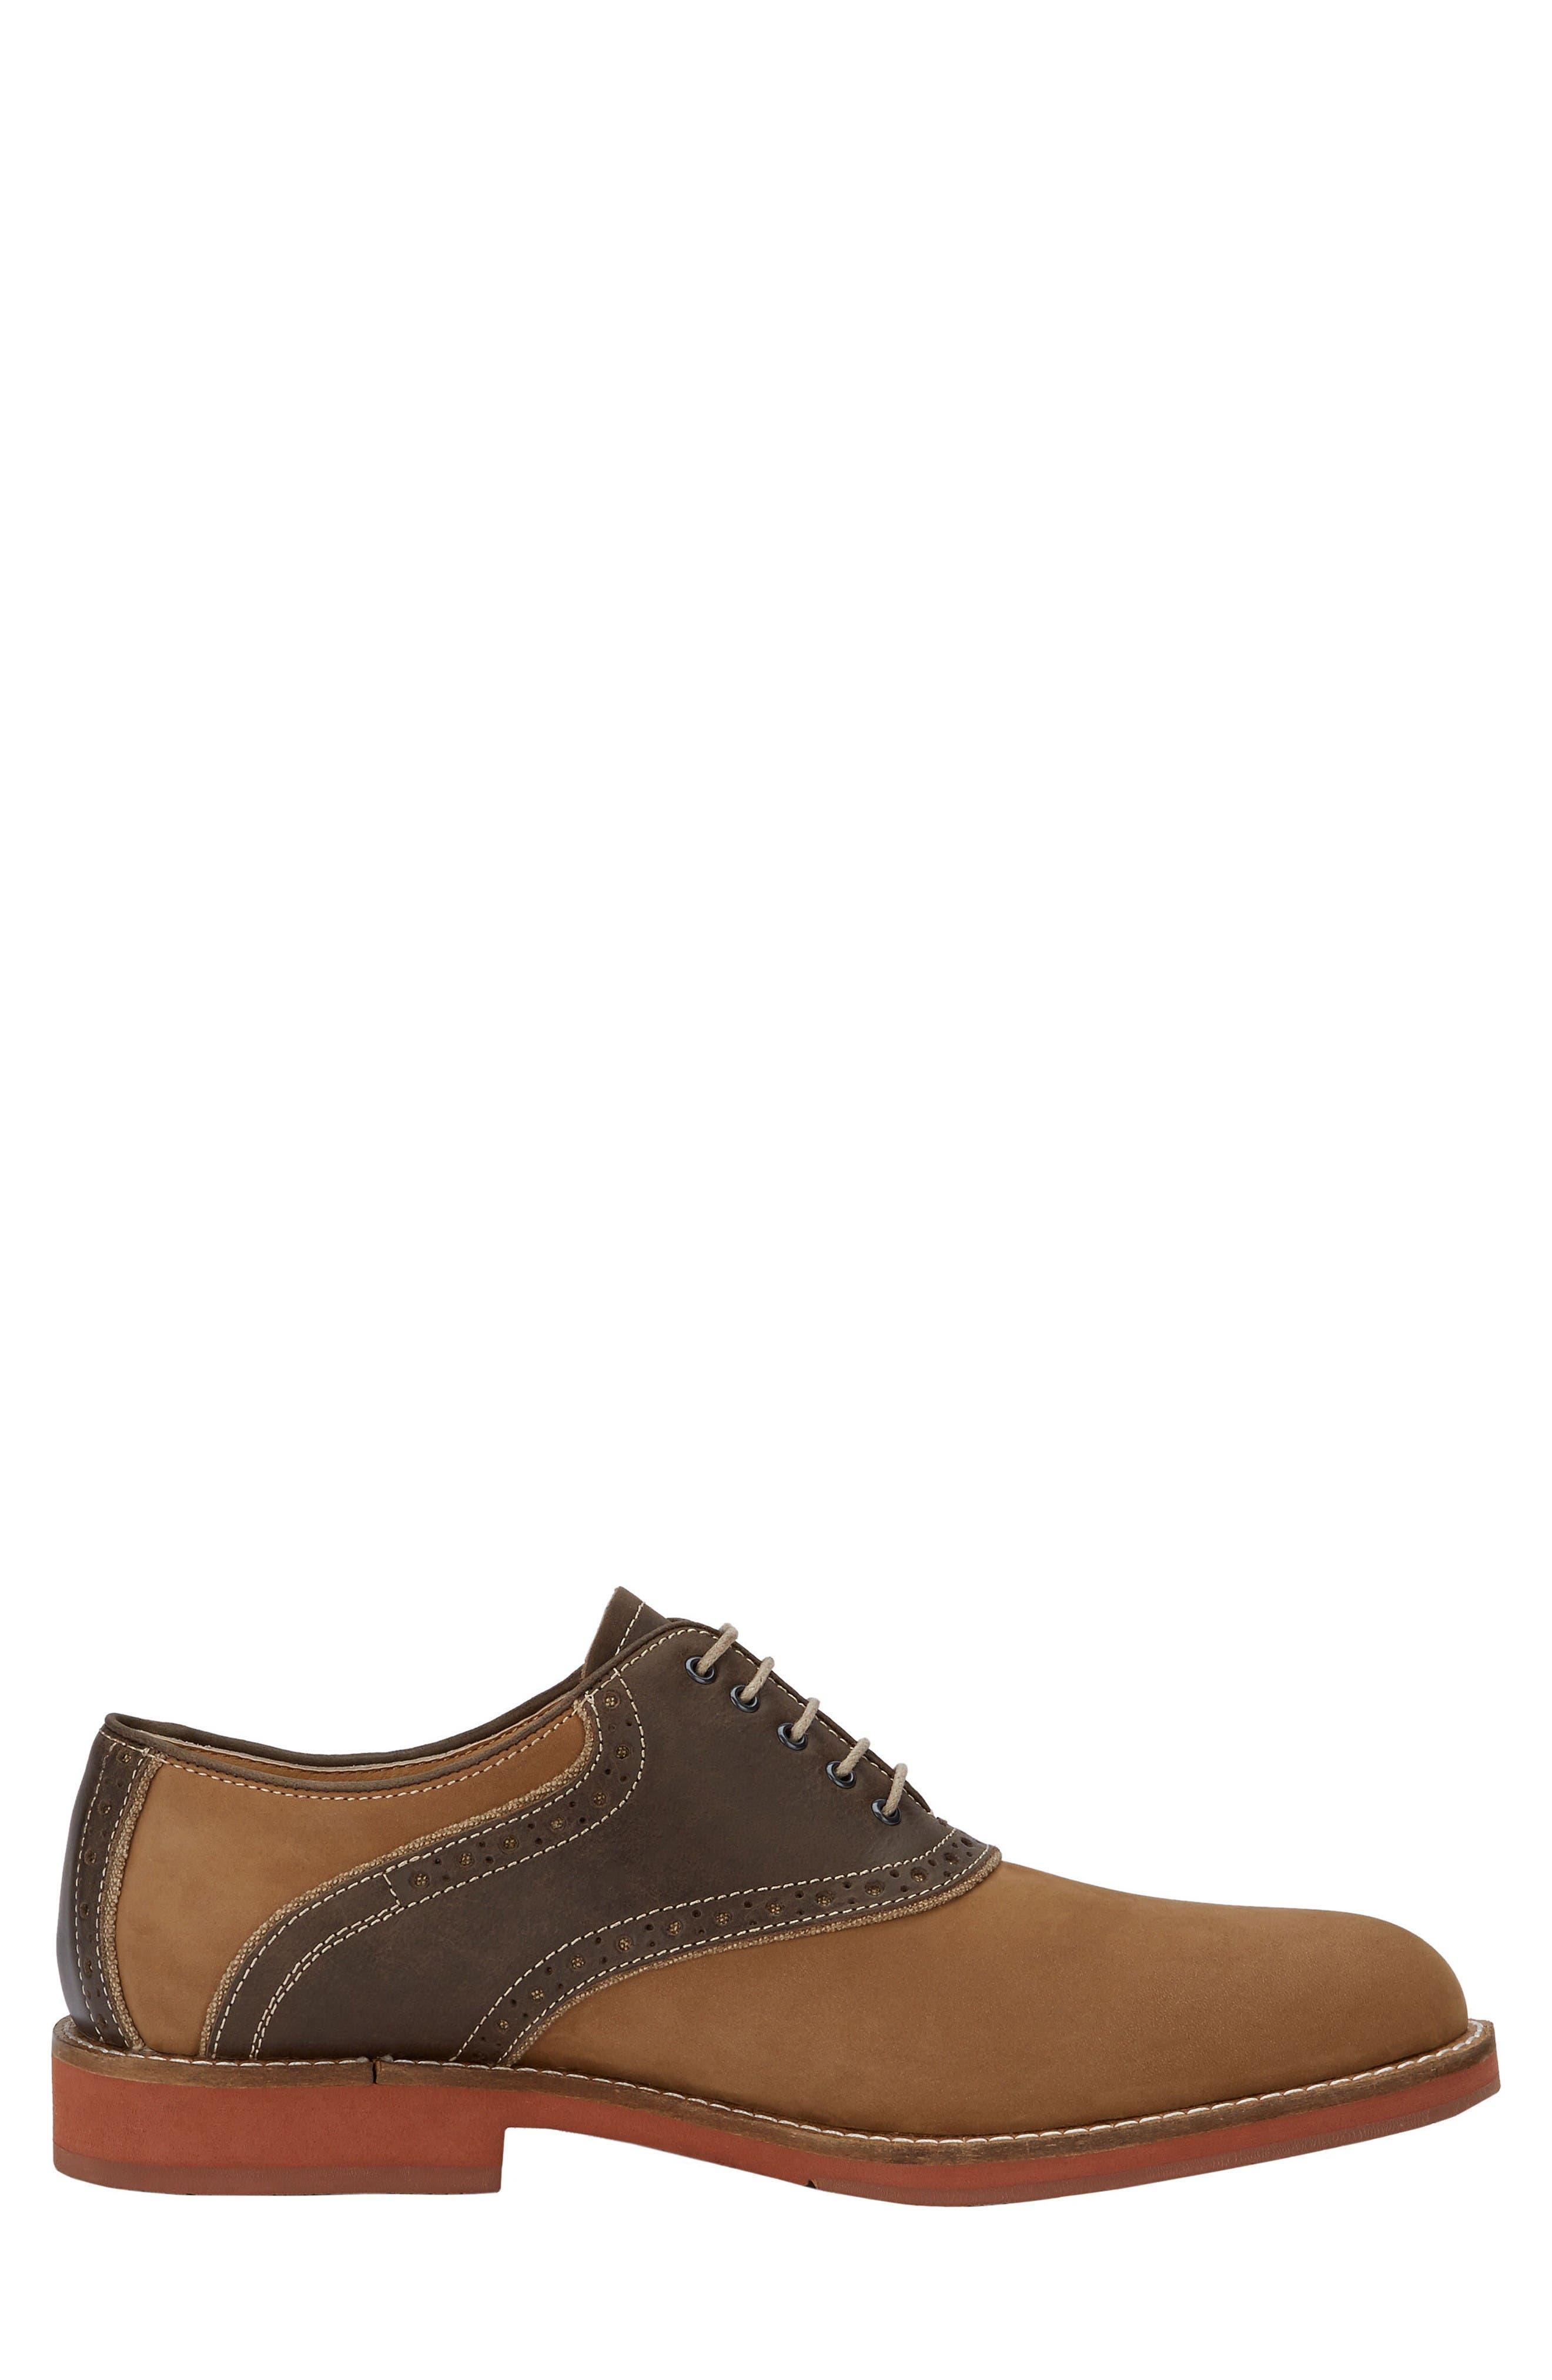 Alternate Image 3  - G.H. Bass & Co. Noah Saddle Shoe (Men)